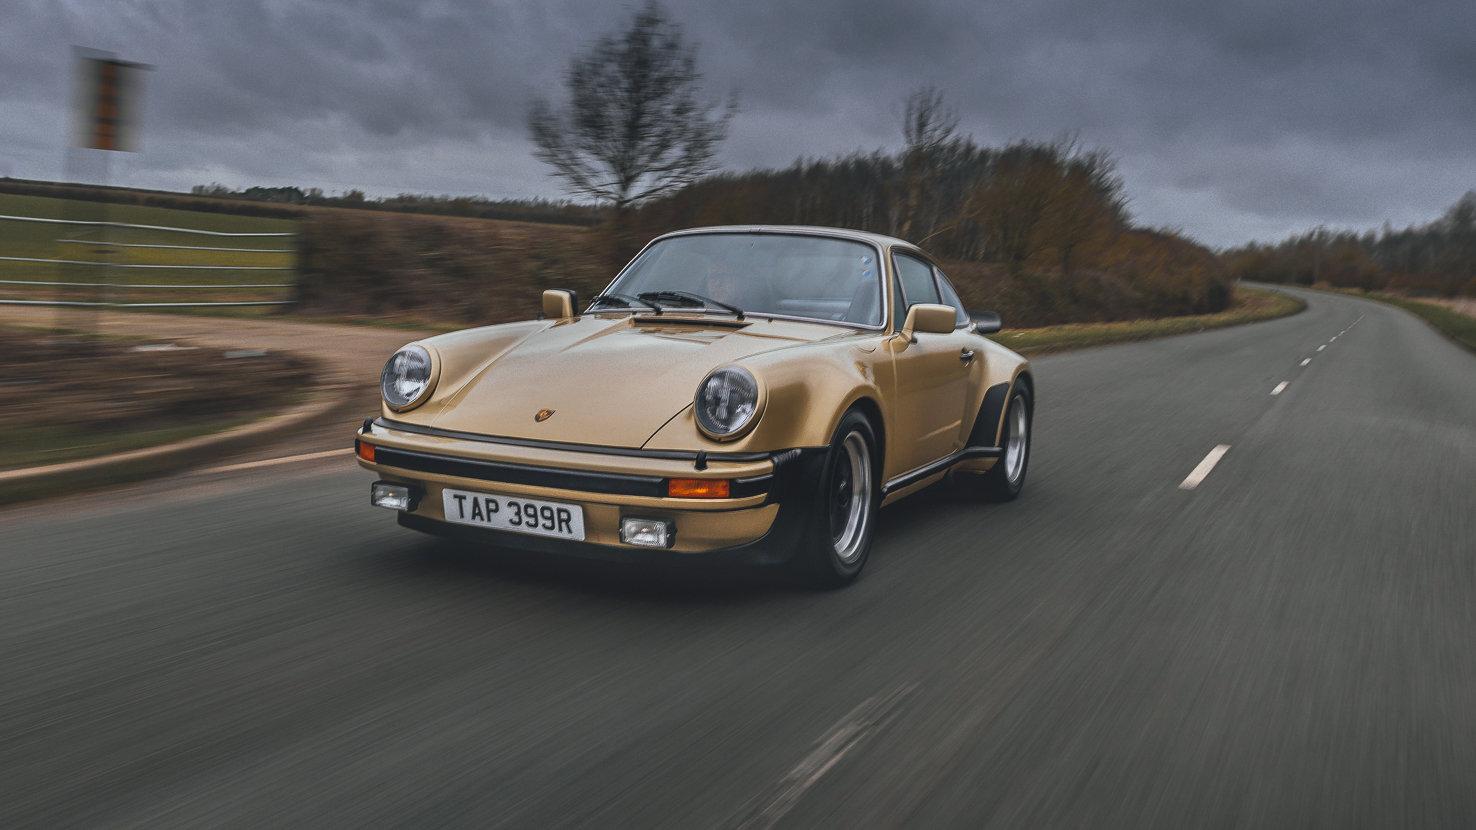 1977 PORSCHE 930 3.0 TURBO – RHD For Sale (picture 2 of 6)